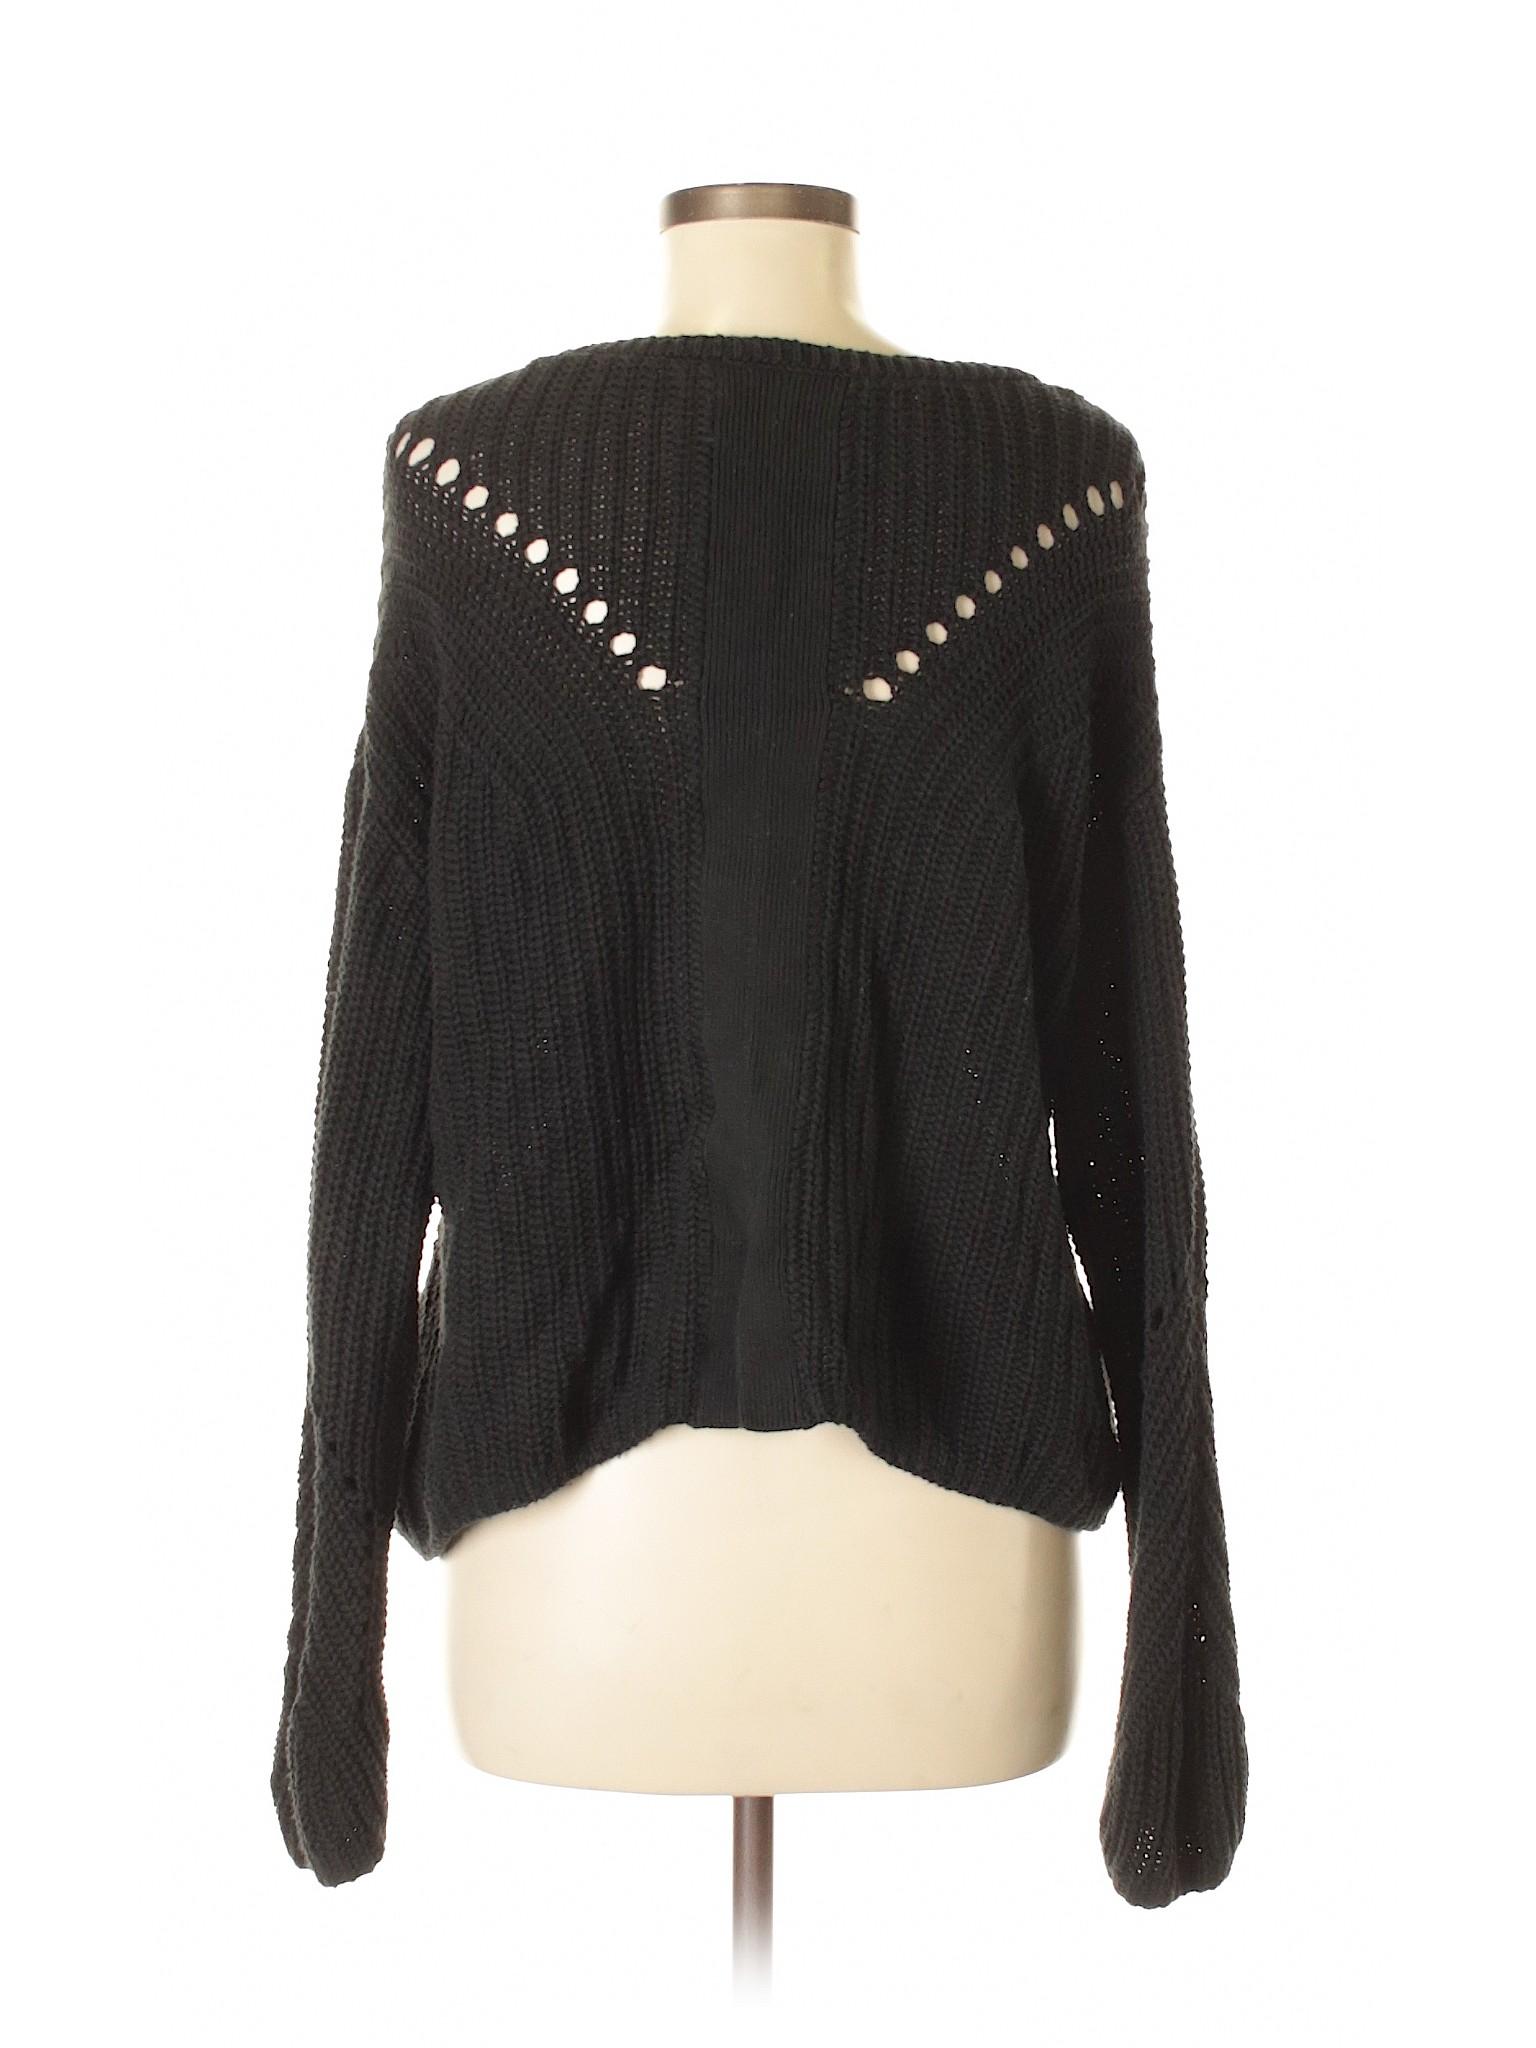 Pullover Gap Sweater Boutique Boutique Gap qOwg7Y8